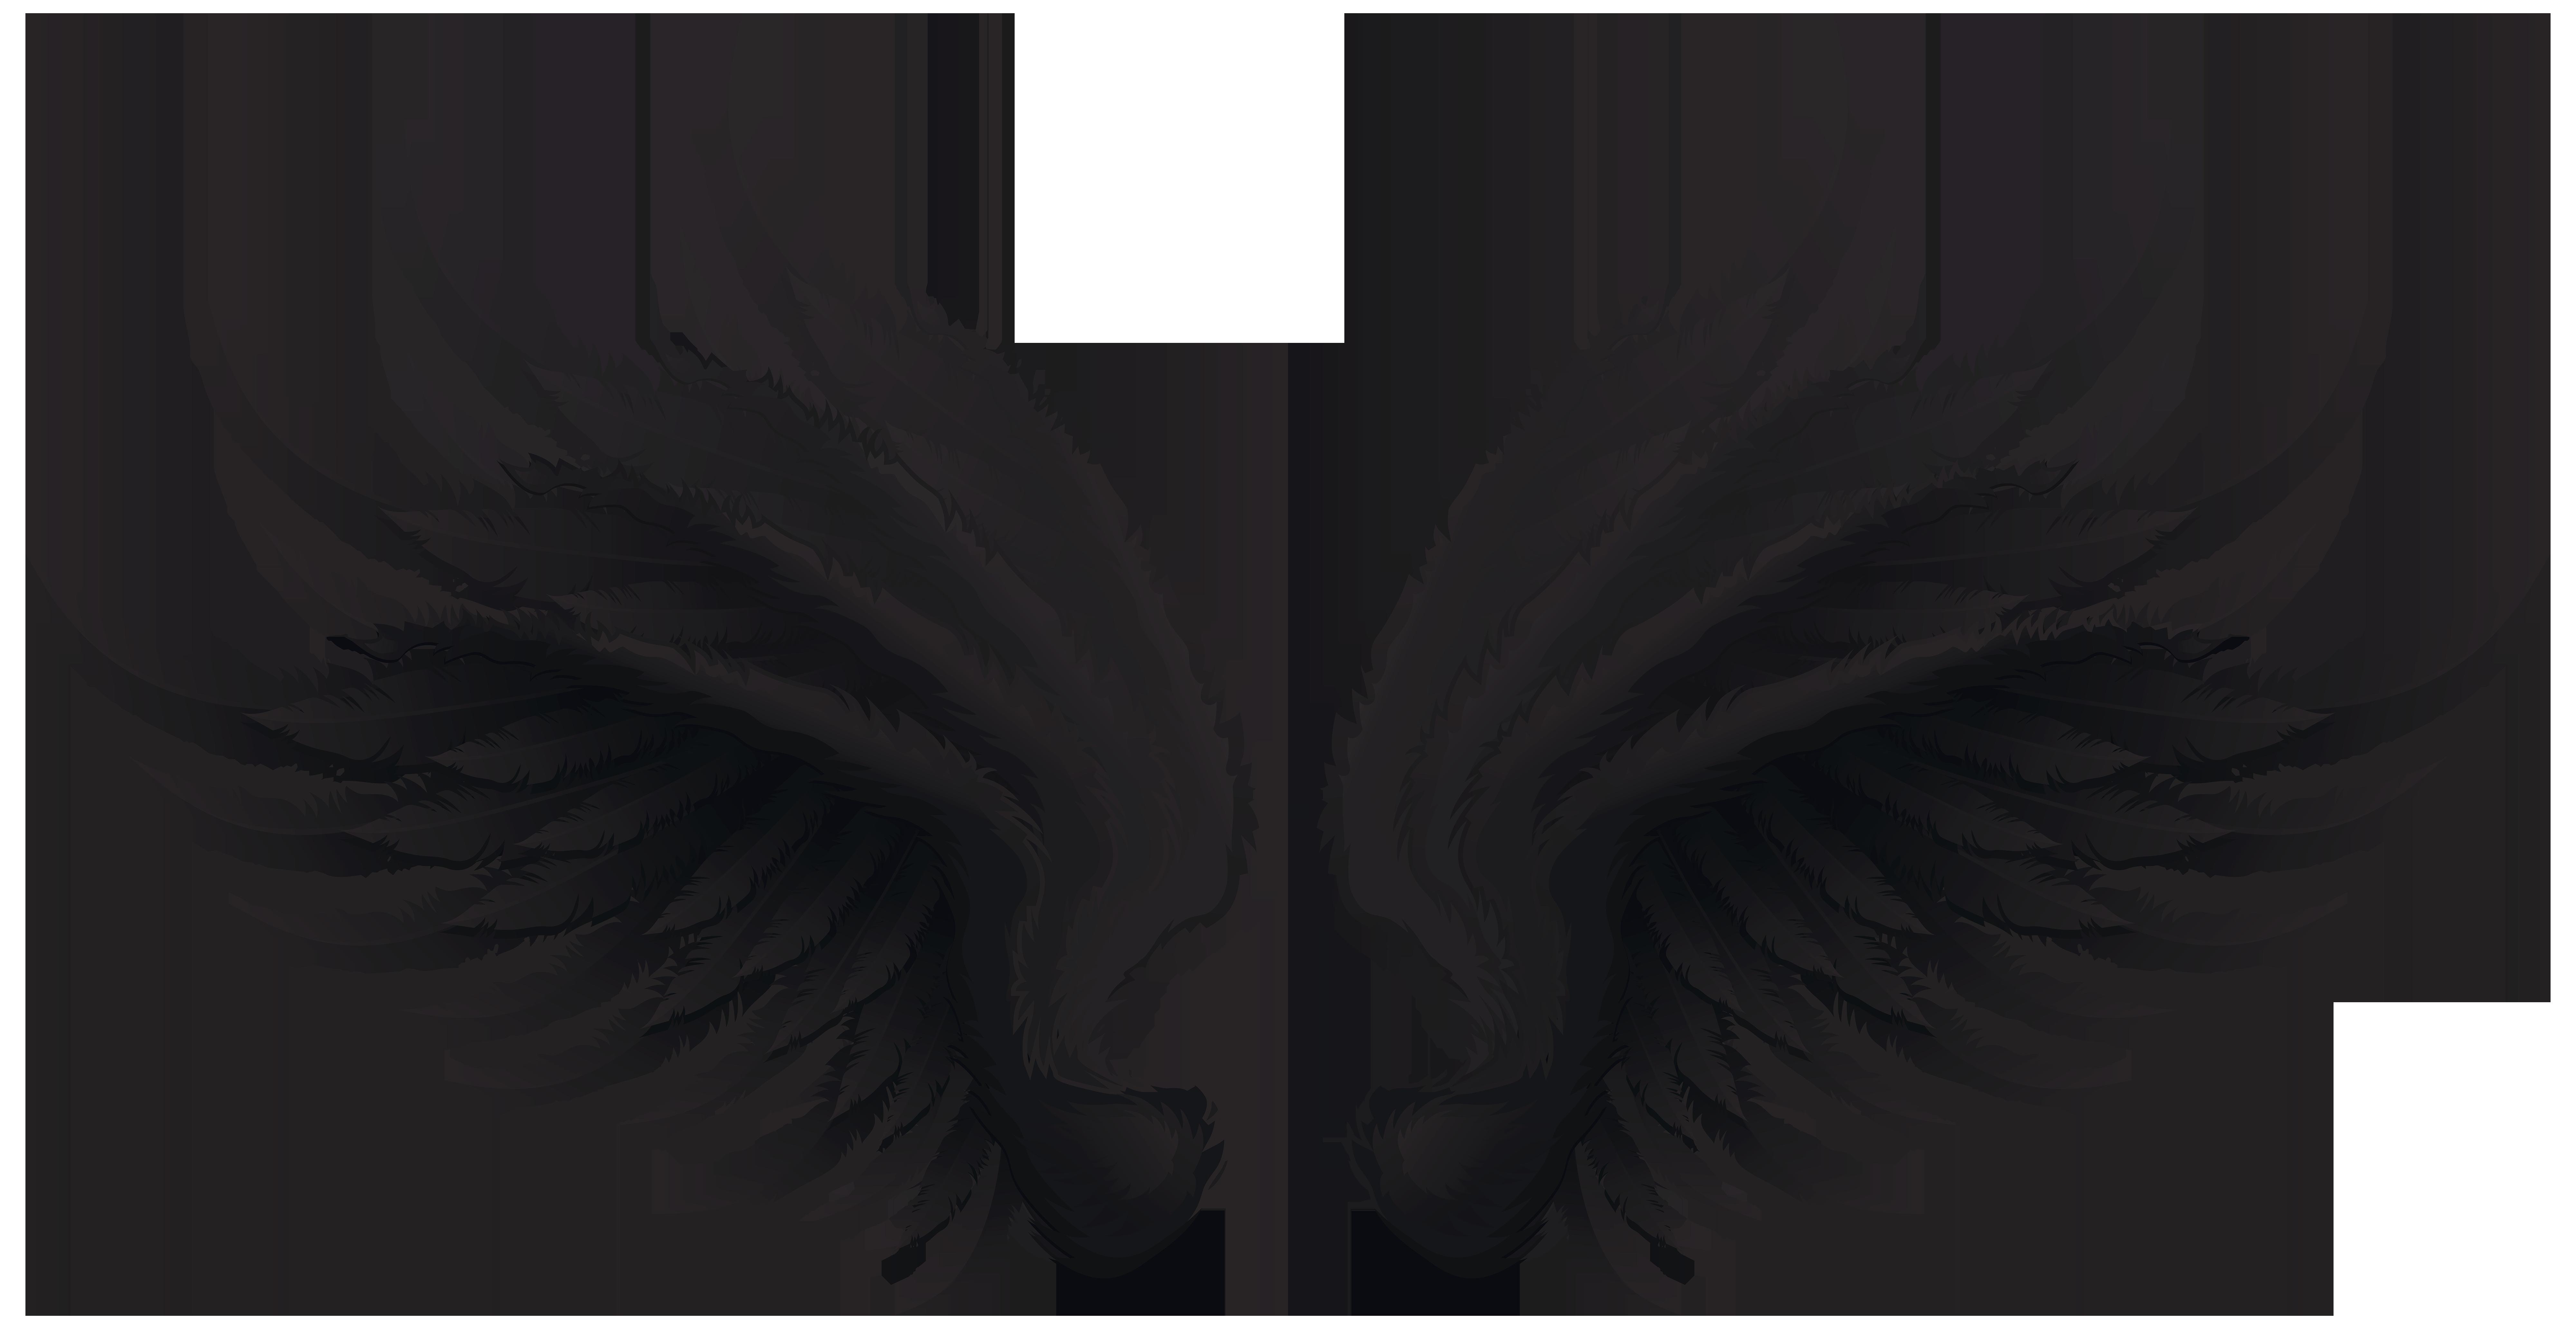 Arte de clip art. Wing clipart feather wing